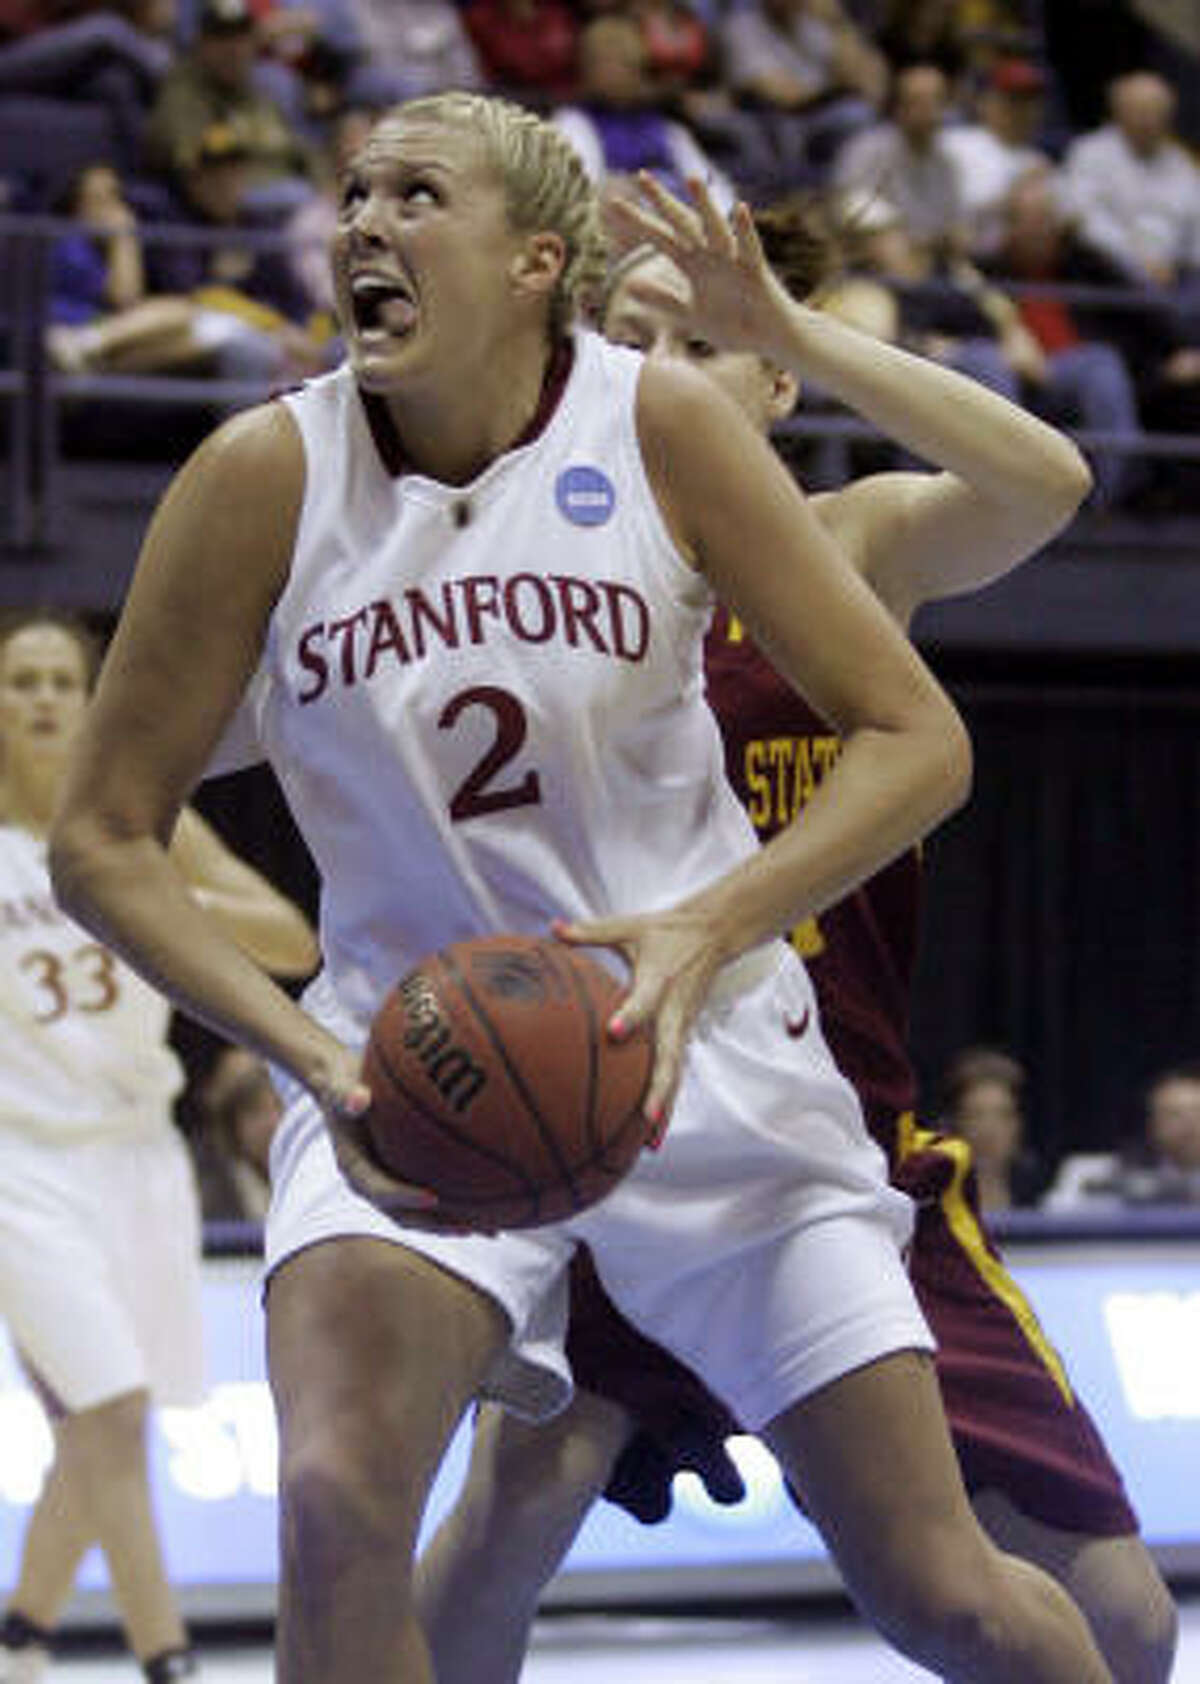 Berkeley (Calif.) Region, Regional Finals: Stanford 74, Iowa State 53 Stanford forward Jayne Appel (2) drives to the basket in the first half.